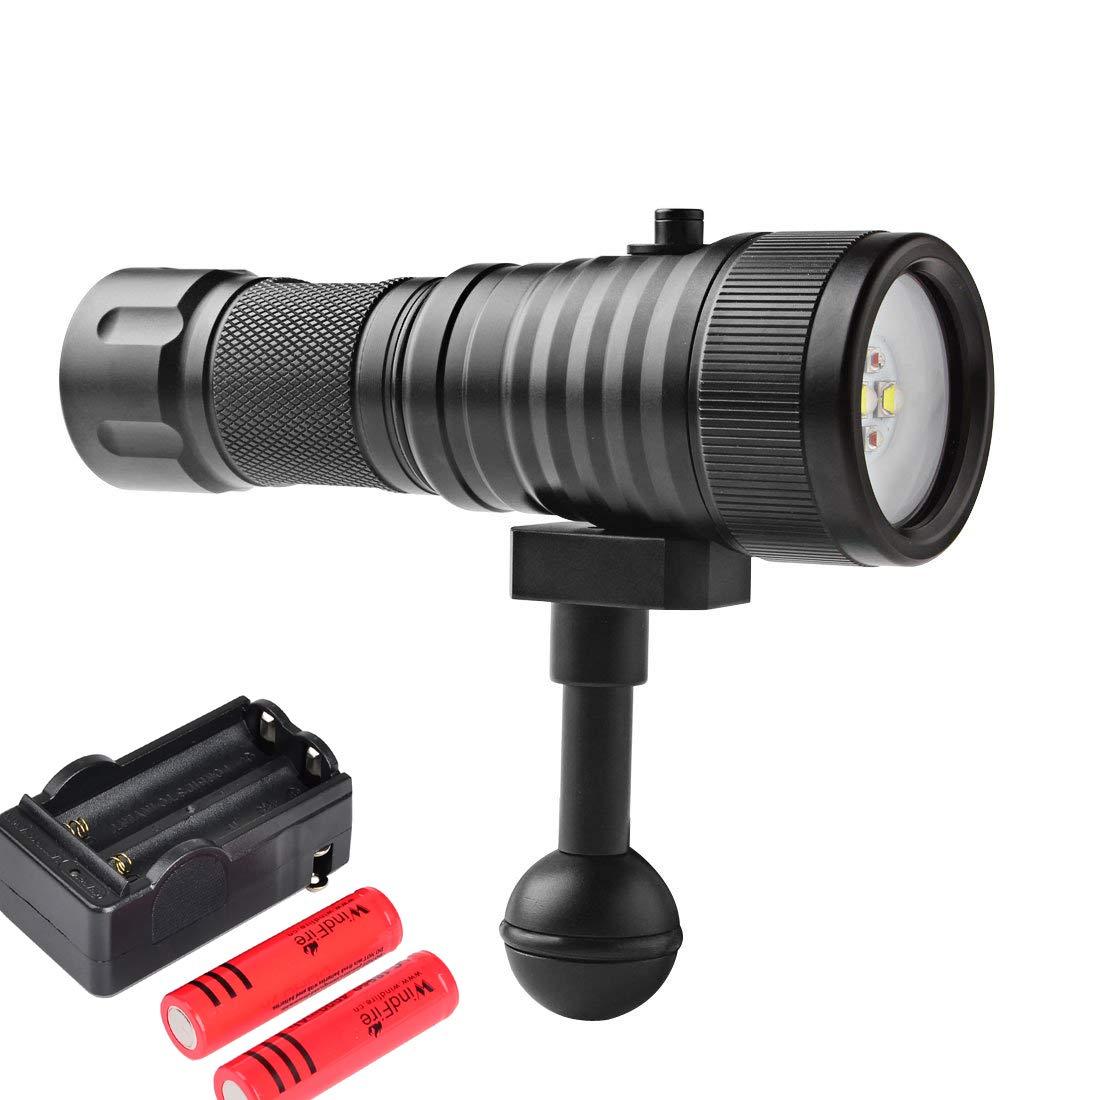 WINDFIRE スキューバダイビングフラッシュライト 水中200M ビデオカメラ 写真ライト トーチ ダイビング懐中電灯 ボールジョイントブラケット付き 18650 充電式バッテリーと充電器   B07PYFKW6Y